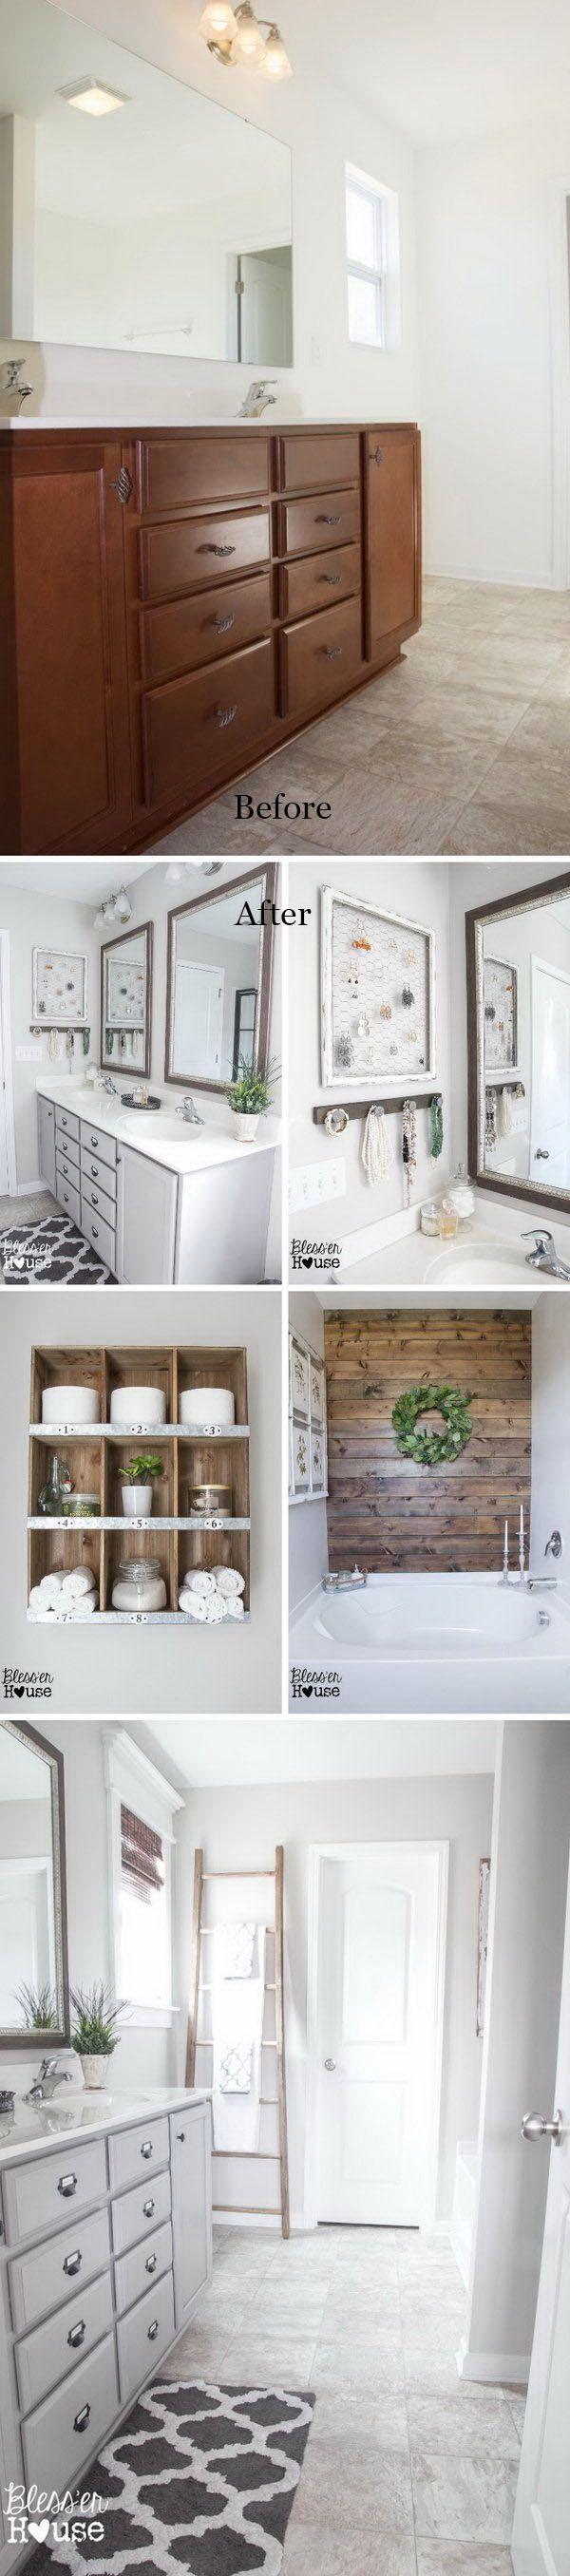 Master Bathroom Budget Makeover: Builder Grade to Rustic Industrial.